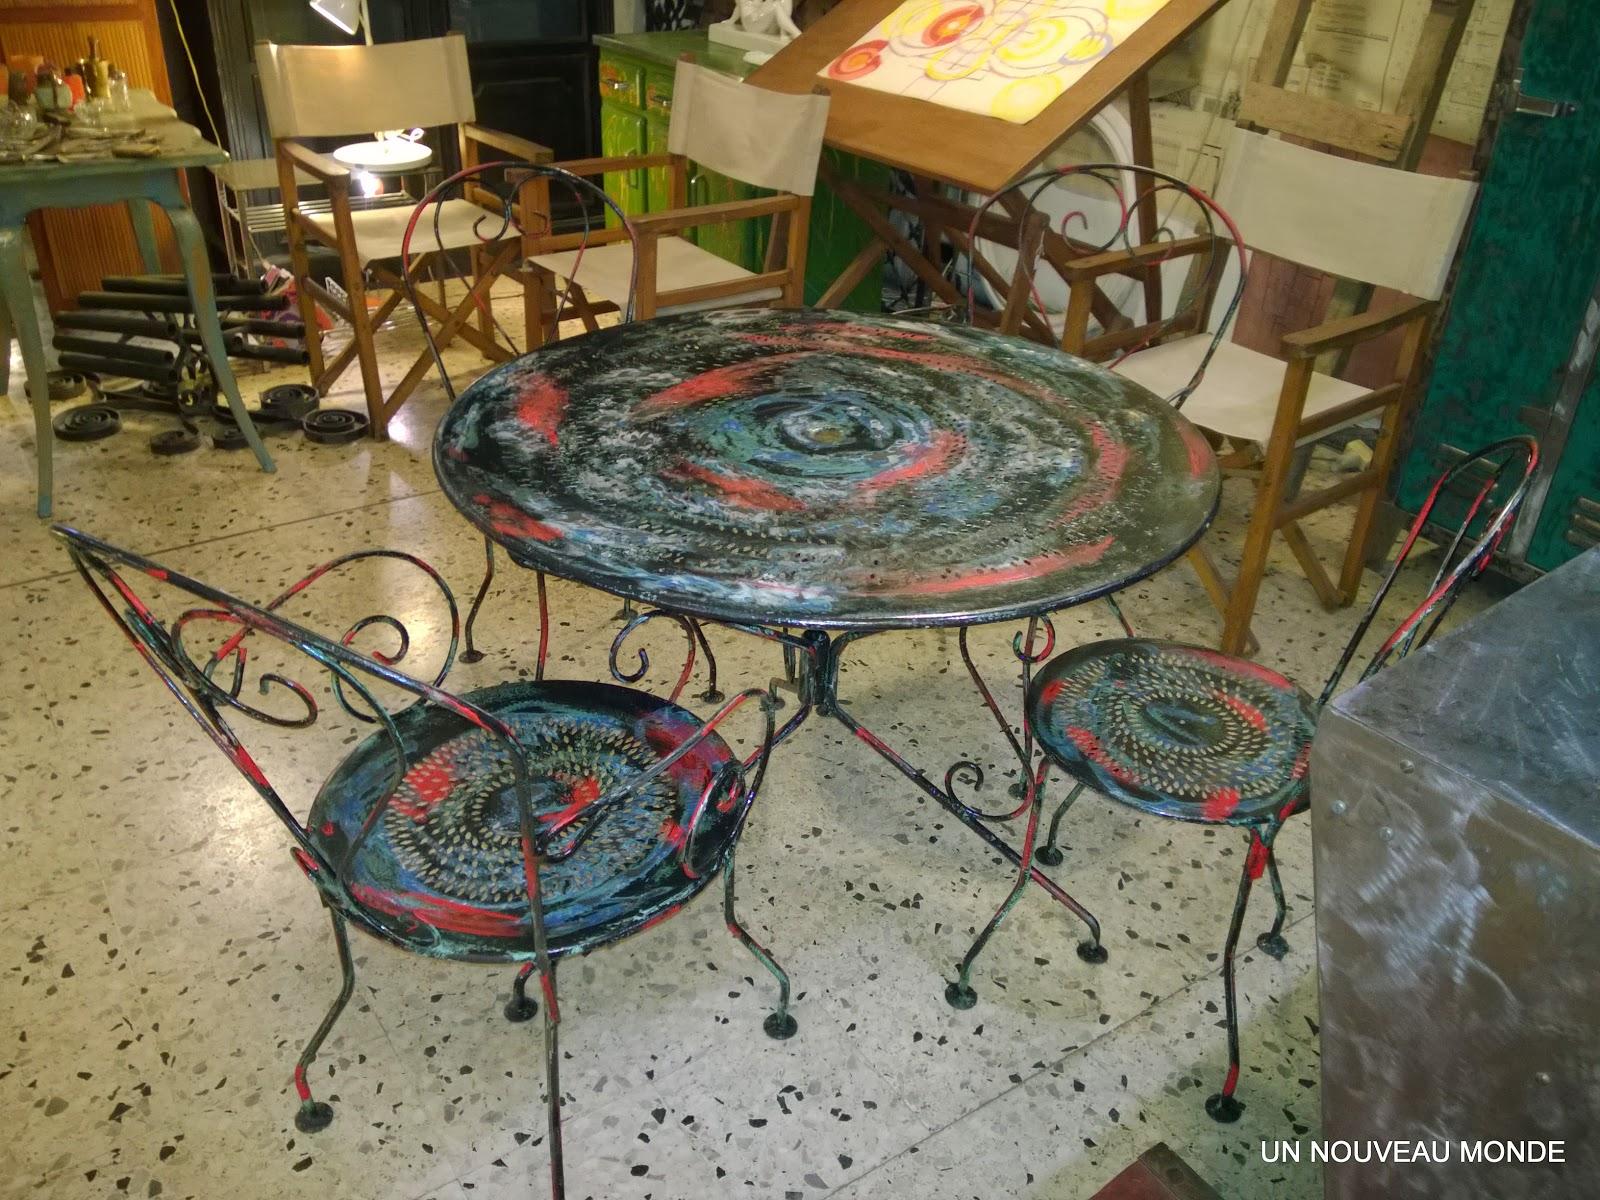 Salon De Jardin Fer Forgé Marocain | Chezmomo Deco Artisanat ...